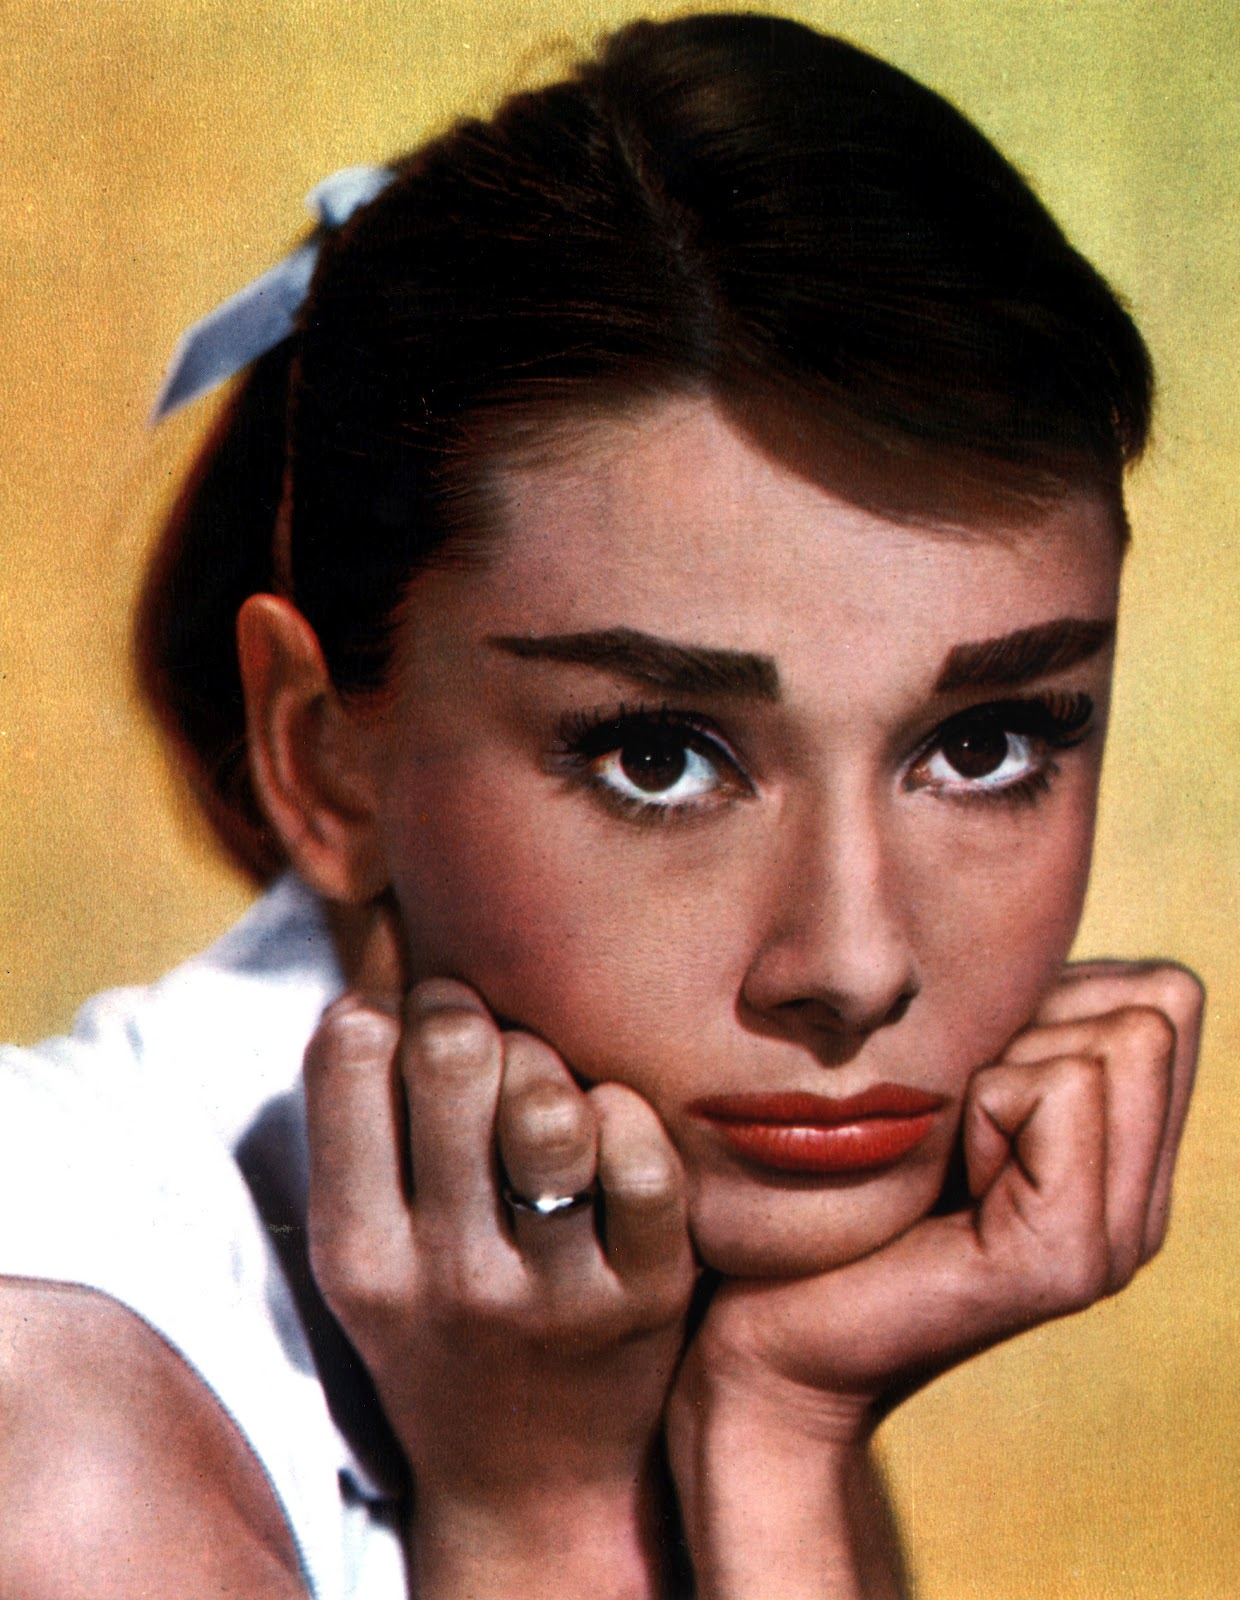 http://1.bp.blogspot.com/-G04AUsHPhlQ/T6R98VrnYgI/AAAAAAAAAZo/68HmT96vkoM/s1600/Audrey+Hepburn+6.jpg